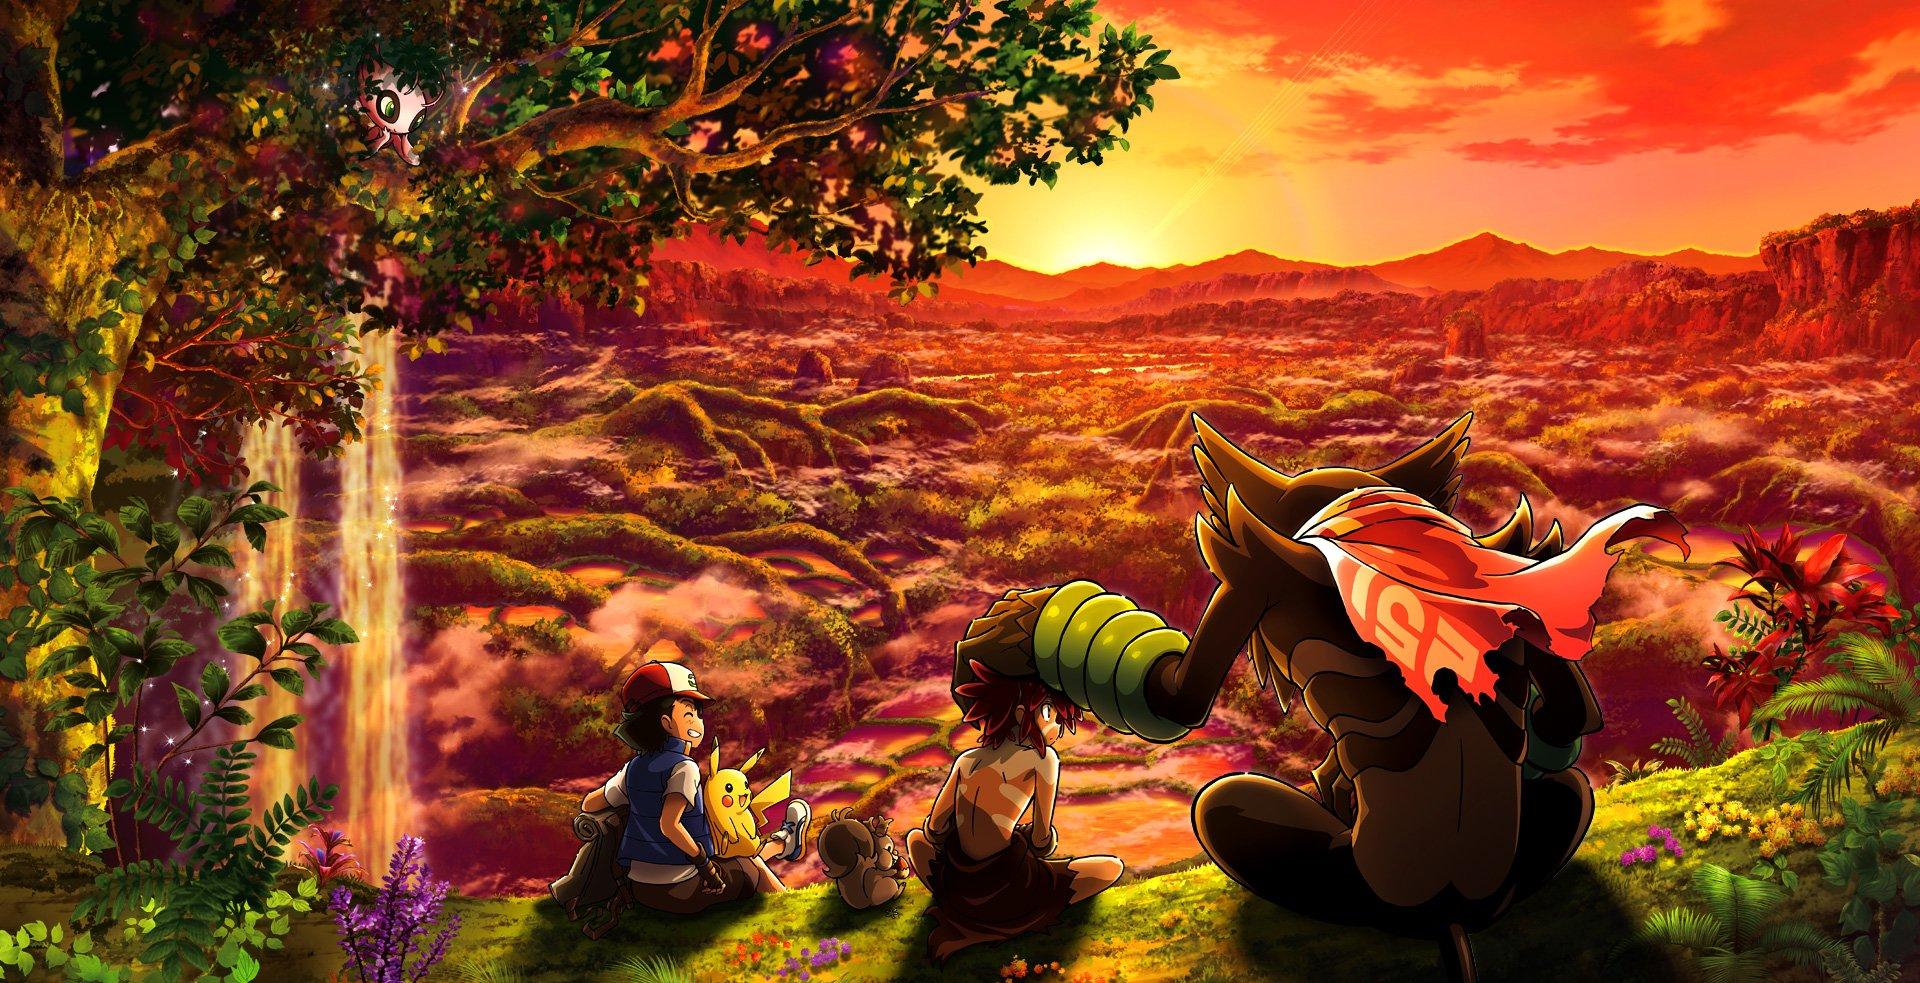 New trailer for Pokémon Movie 23: Coco shows off Zarude and Shiny Celebi